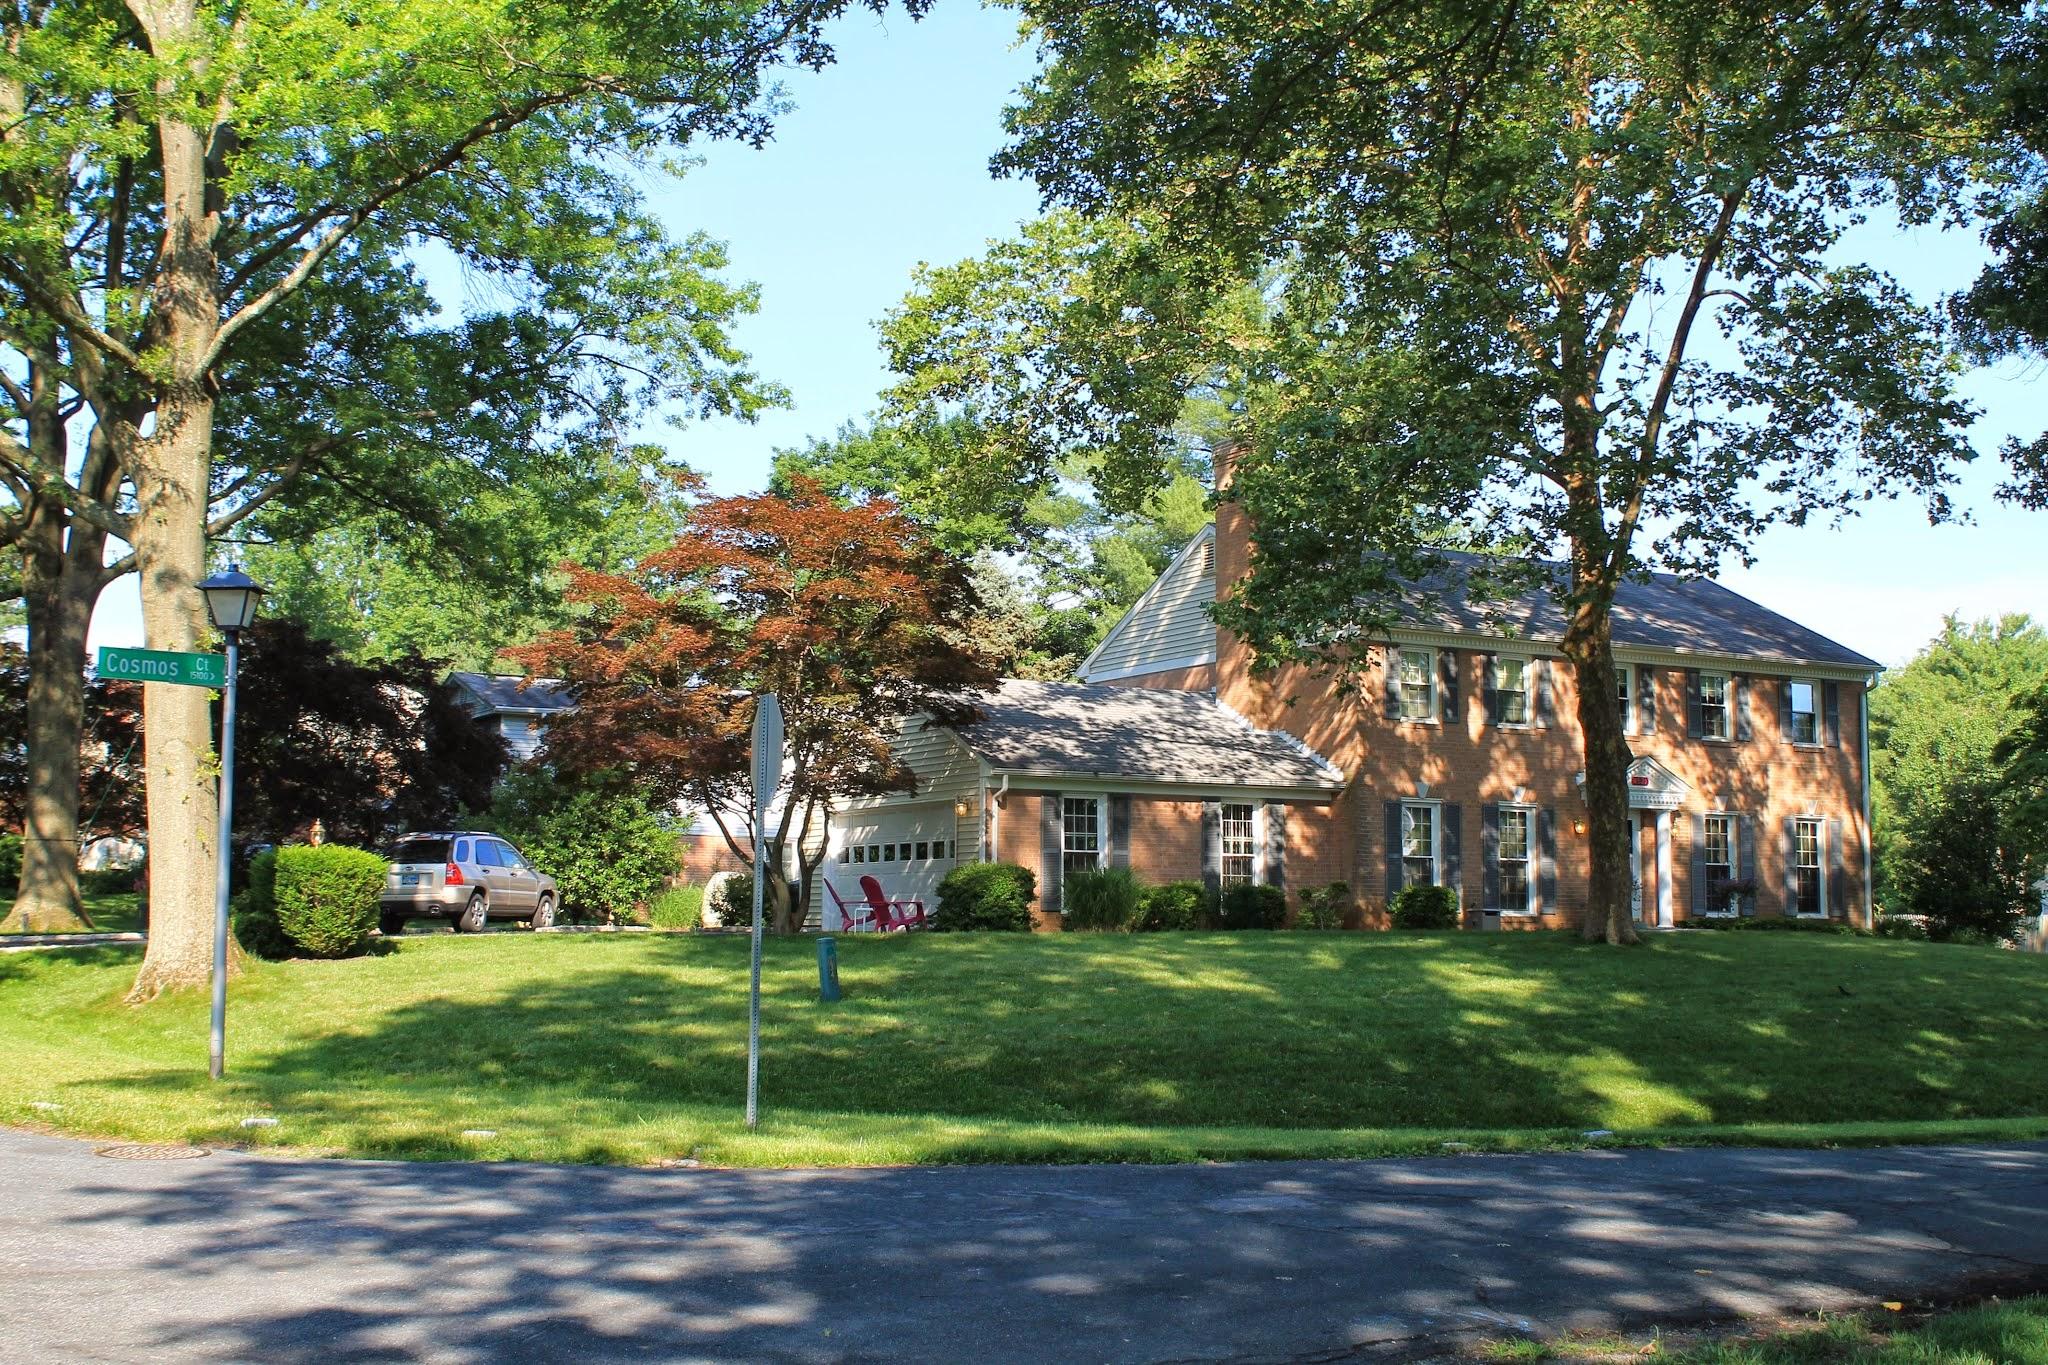 Home on Cosmos Court in Flower Valley neighborhood